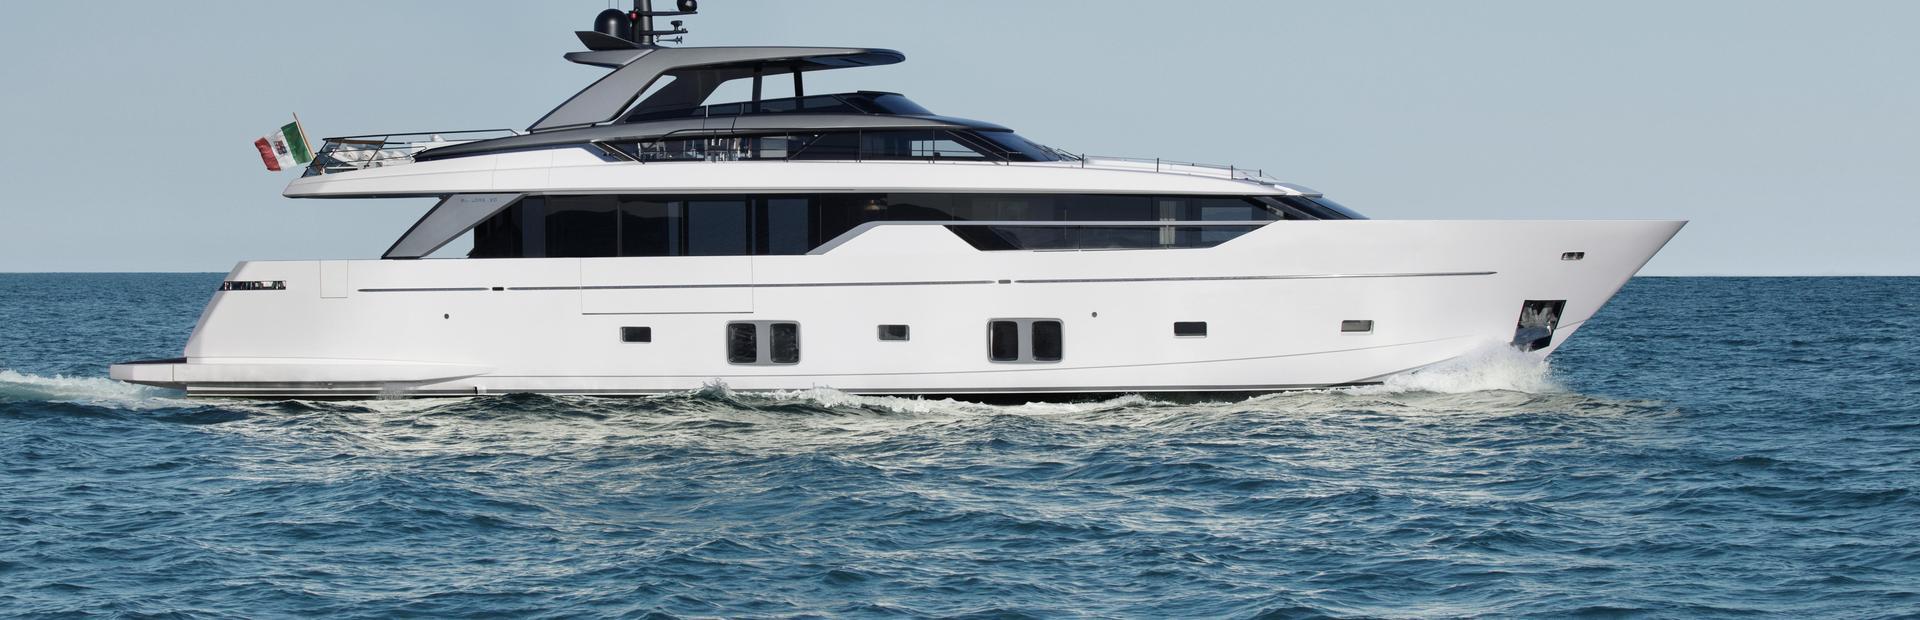 SL102 Asymmetric Yacht Charter